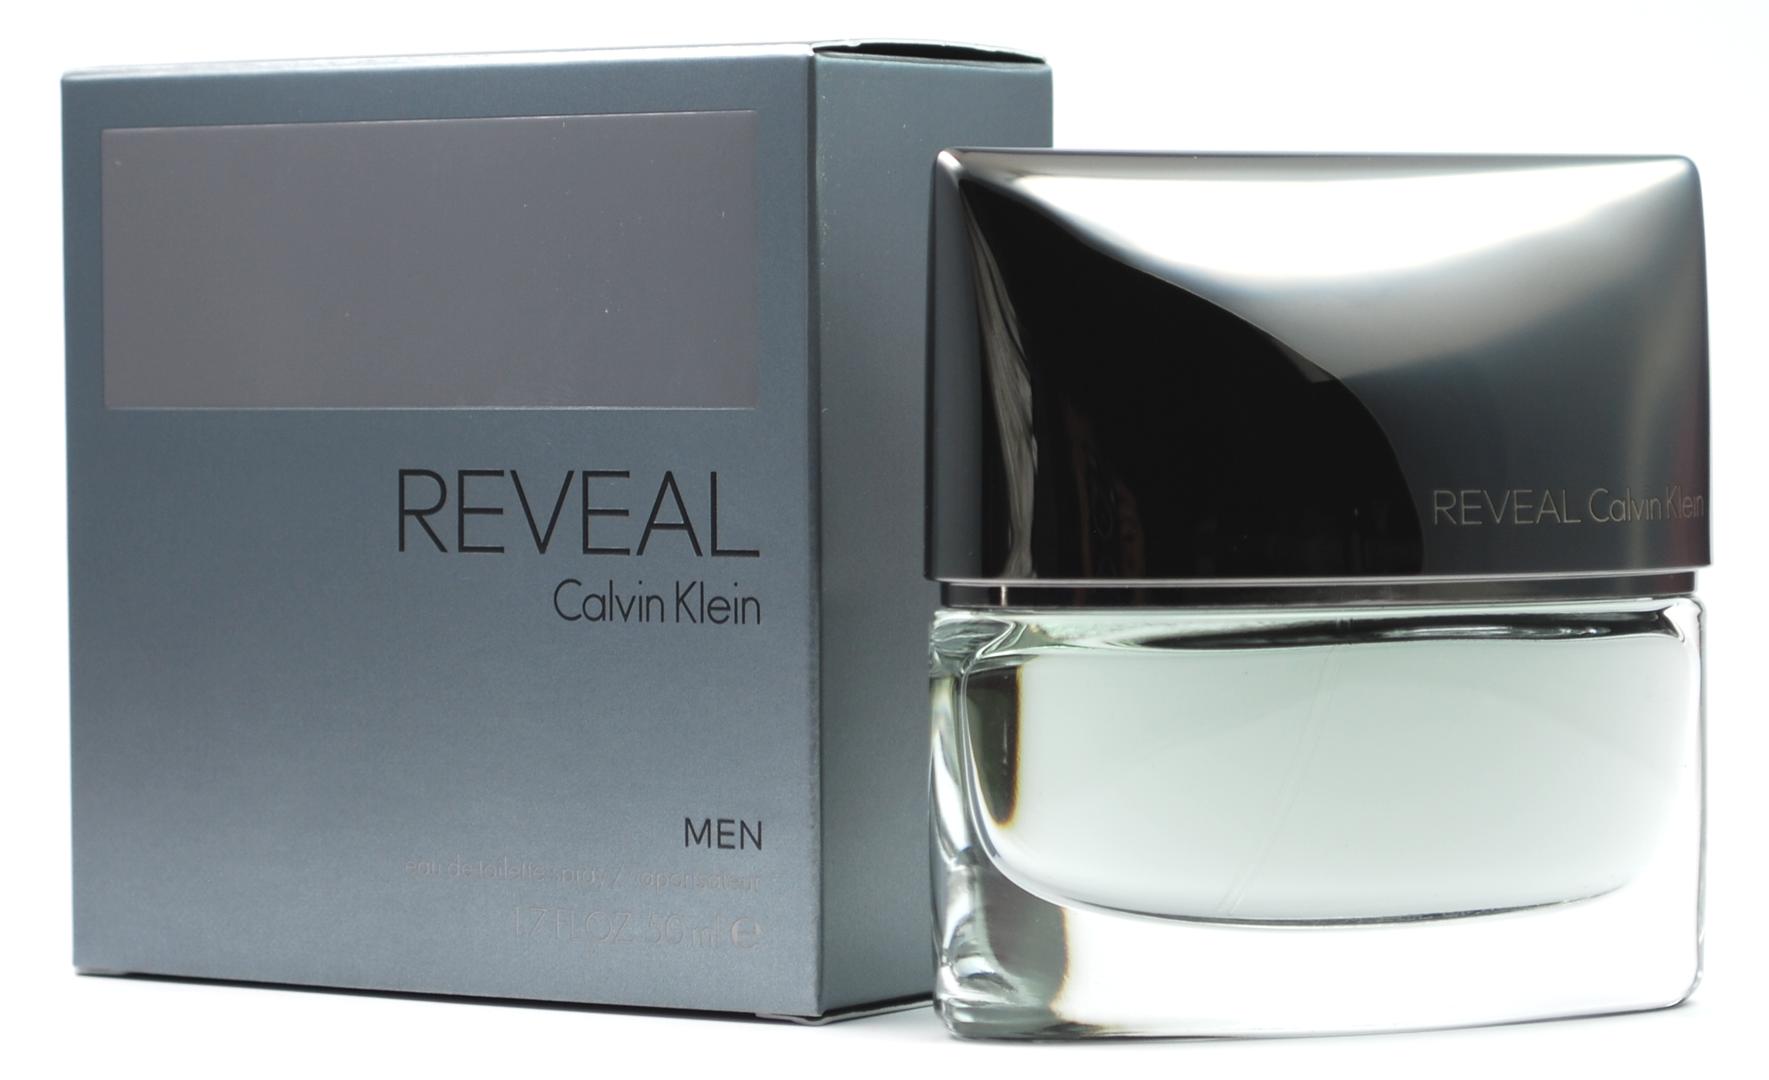 Calvin Klein Reveal for Men, Toaletní voda, 50ml, Pánska vôňa, + AKCE: dárek zdarma